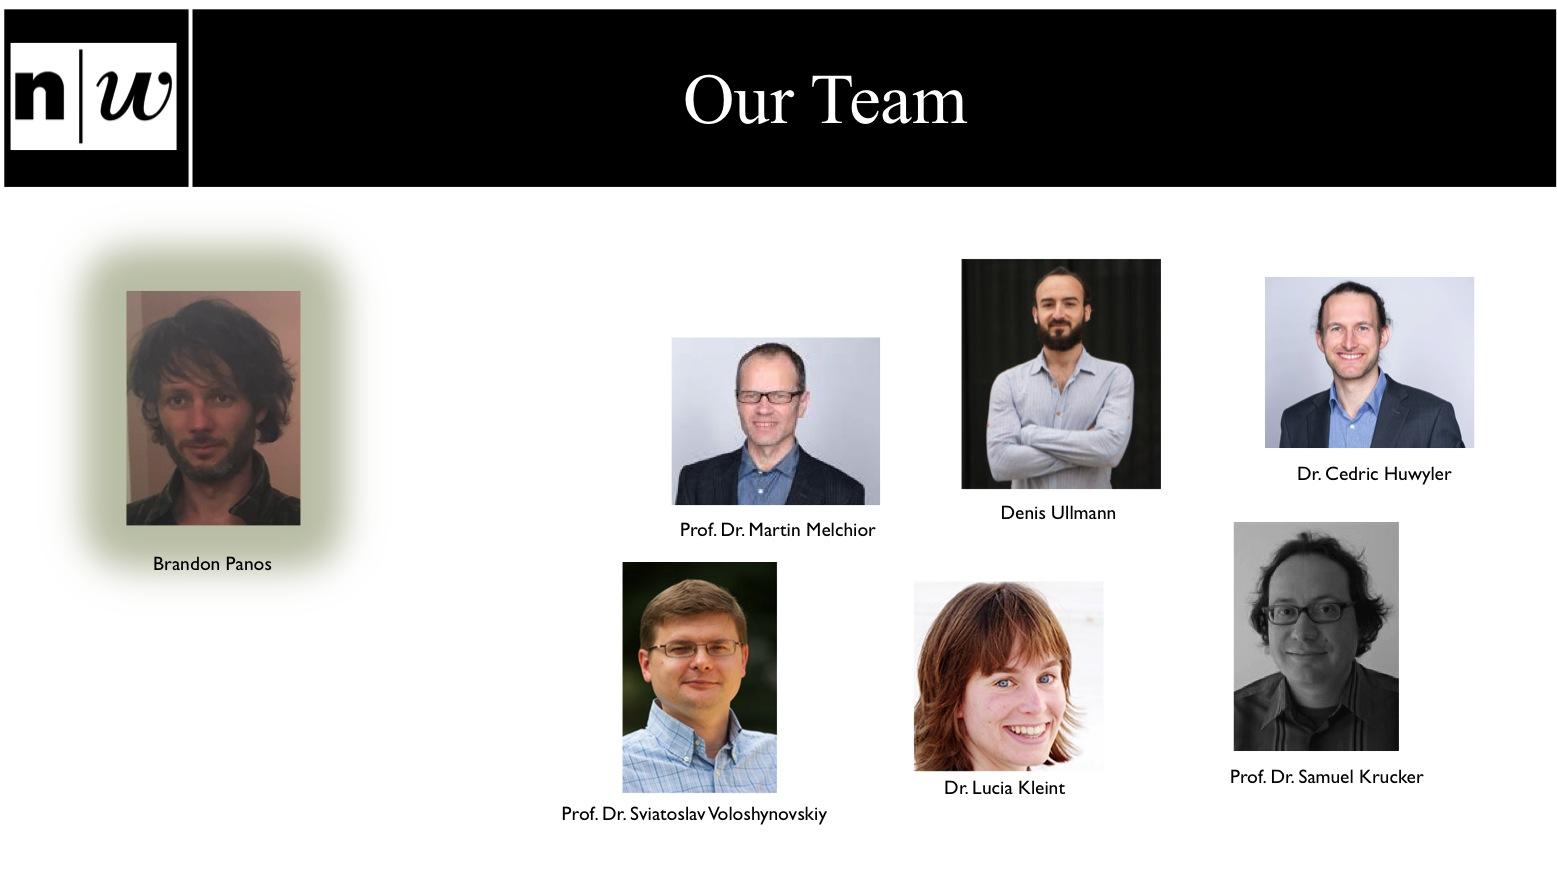 The team: Brandon Panos, Martin Melchior, Dennis Ullmann, Cedric Huwyler, Sviatoslav Voloshynovskiy,Lucia Kleint, Samuel Krucker